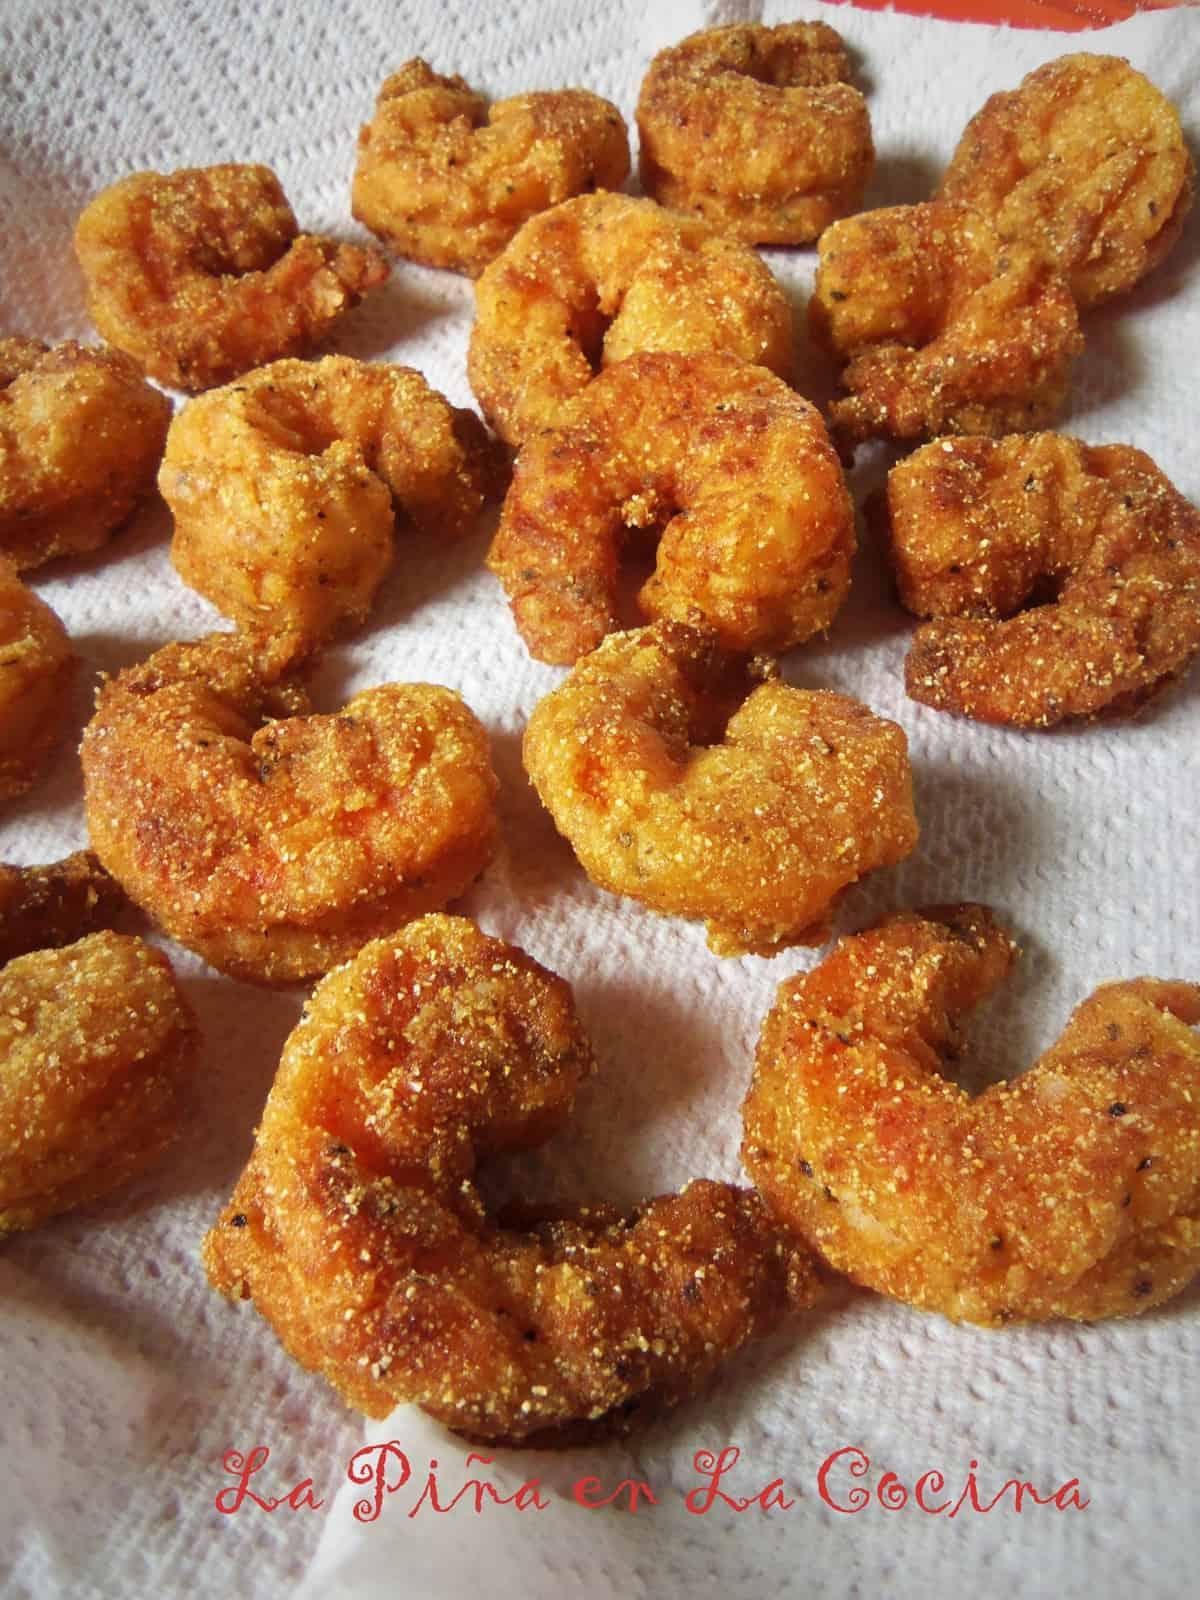 Crispy Shrimp for Po Boys or Toss in Buffalo Sauce!